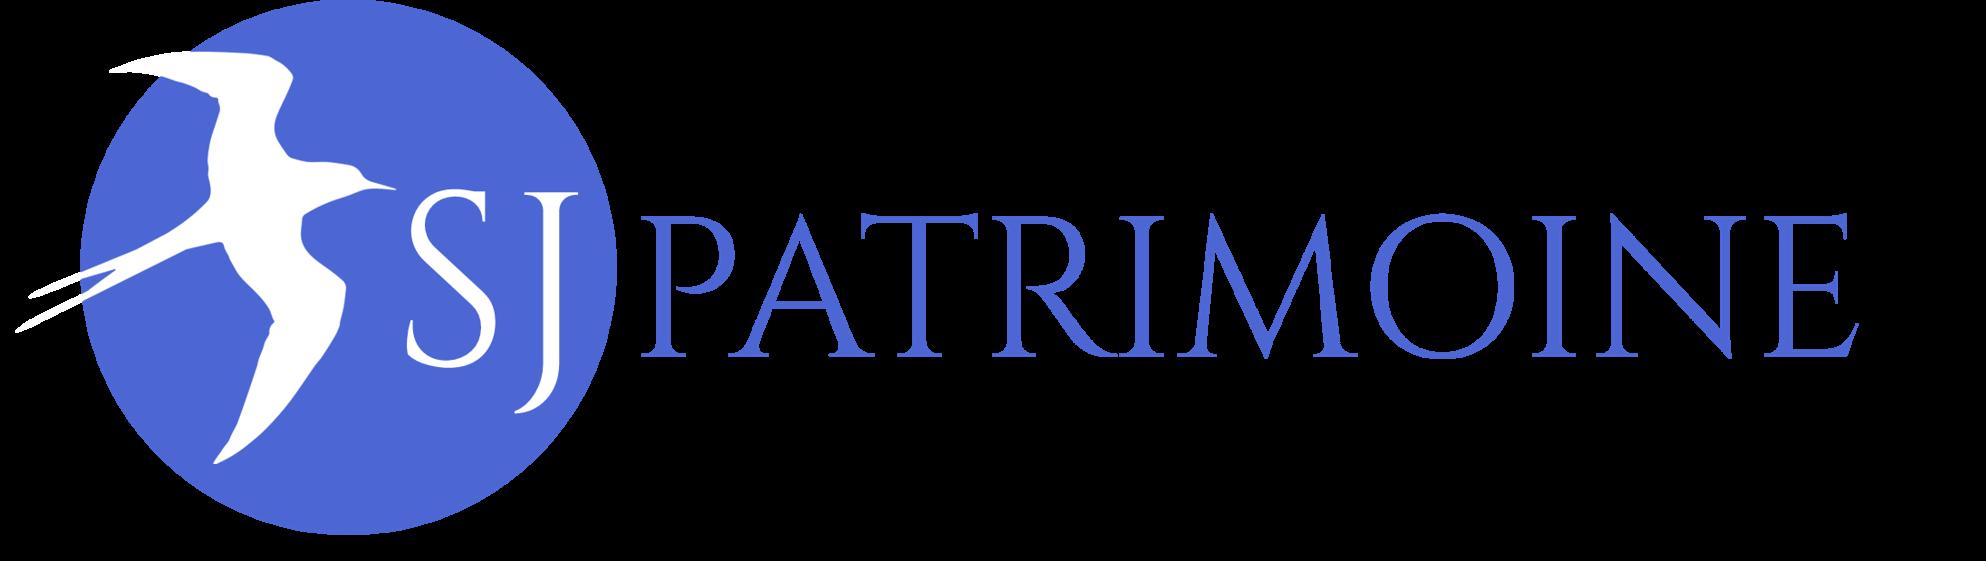 SJ Patrimoine